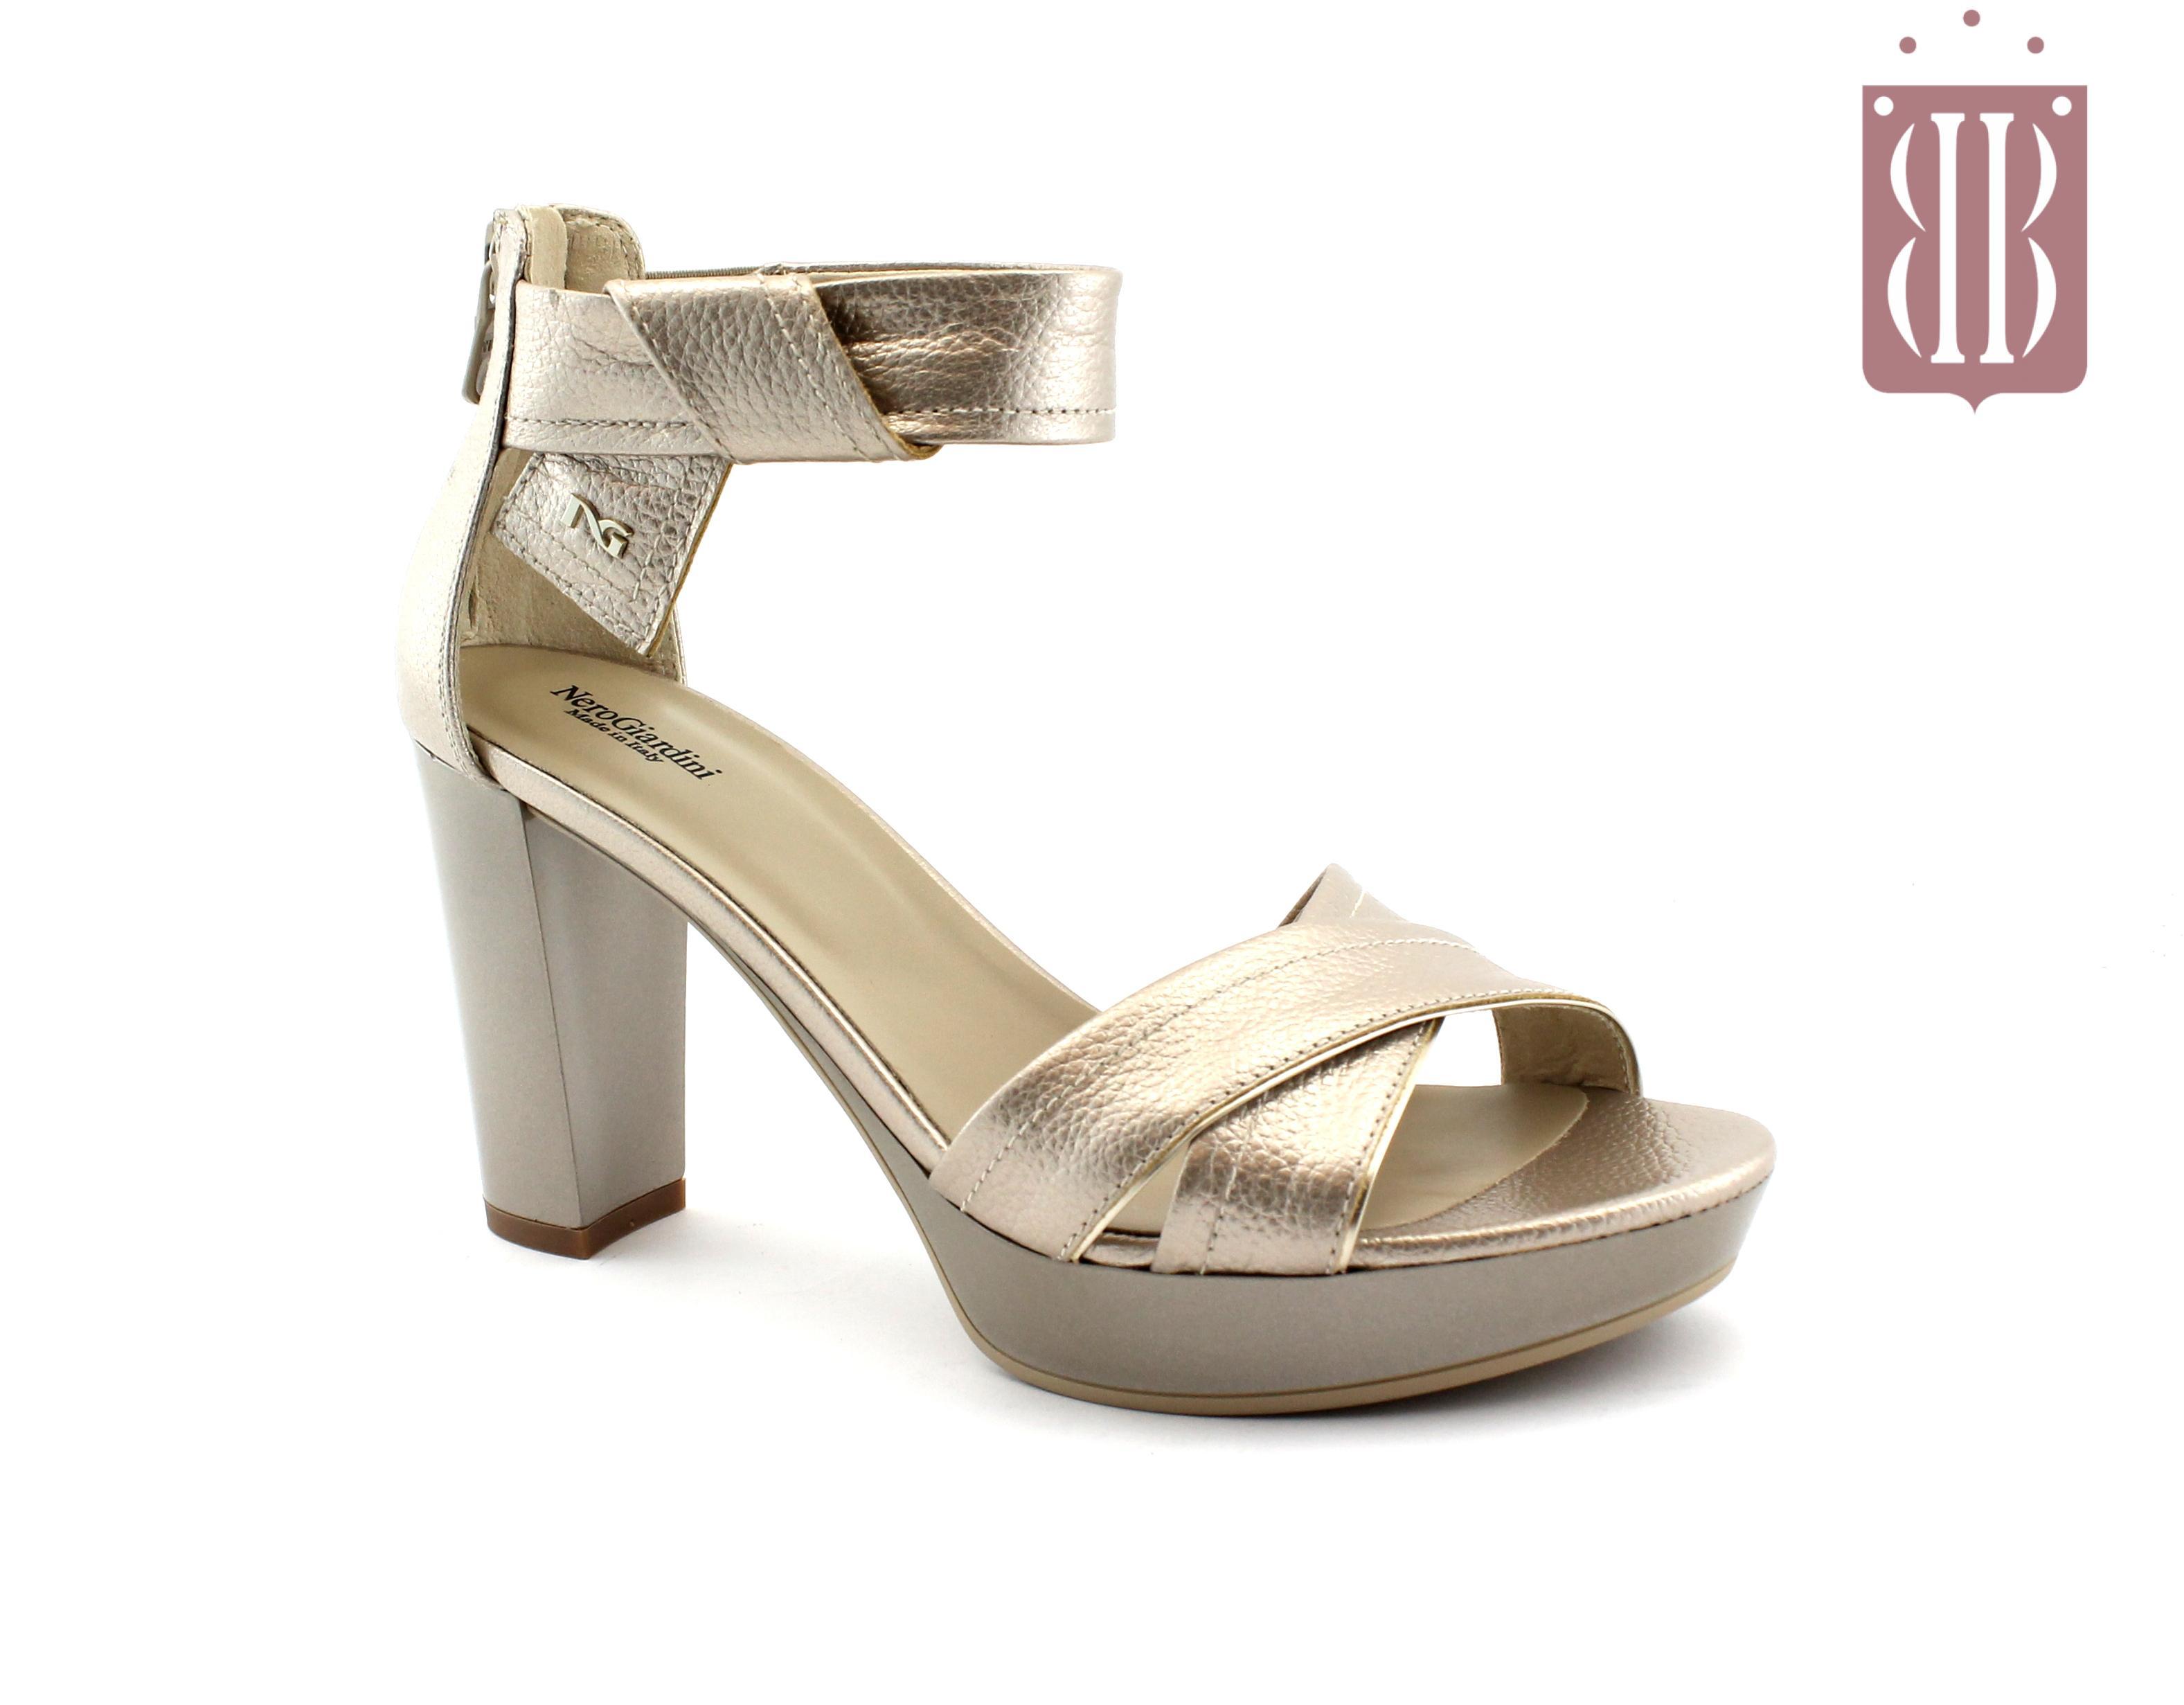 01aac8fe7e NERO GIARDINI 8080 marte nut beige scarpe donna sandali tacco spuntate,  cinturino zip tallone